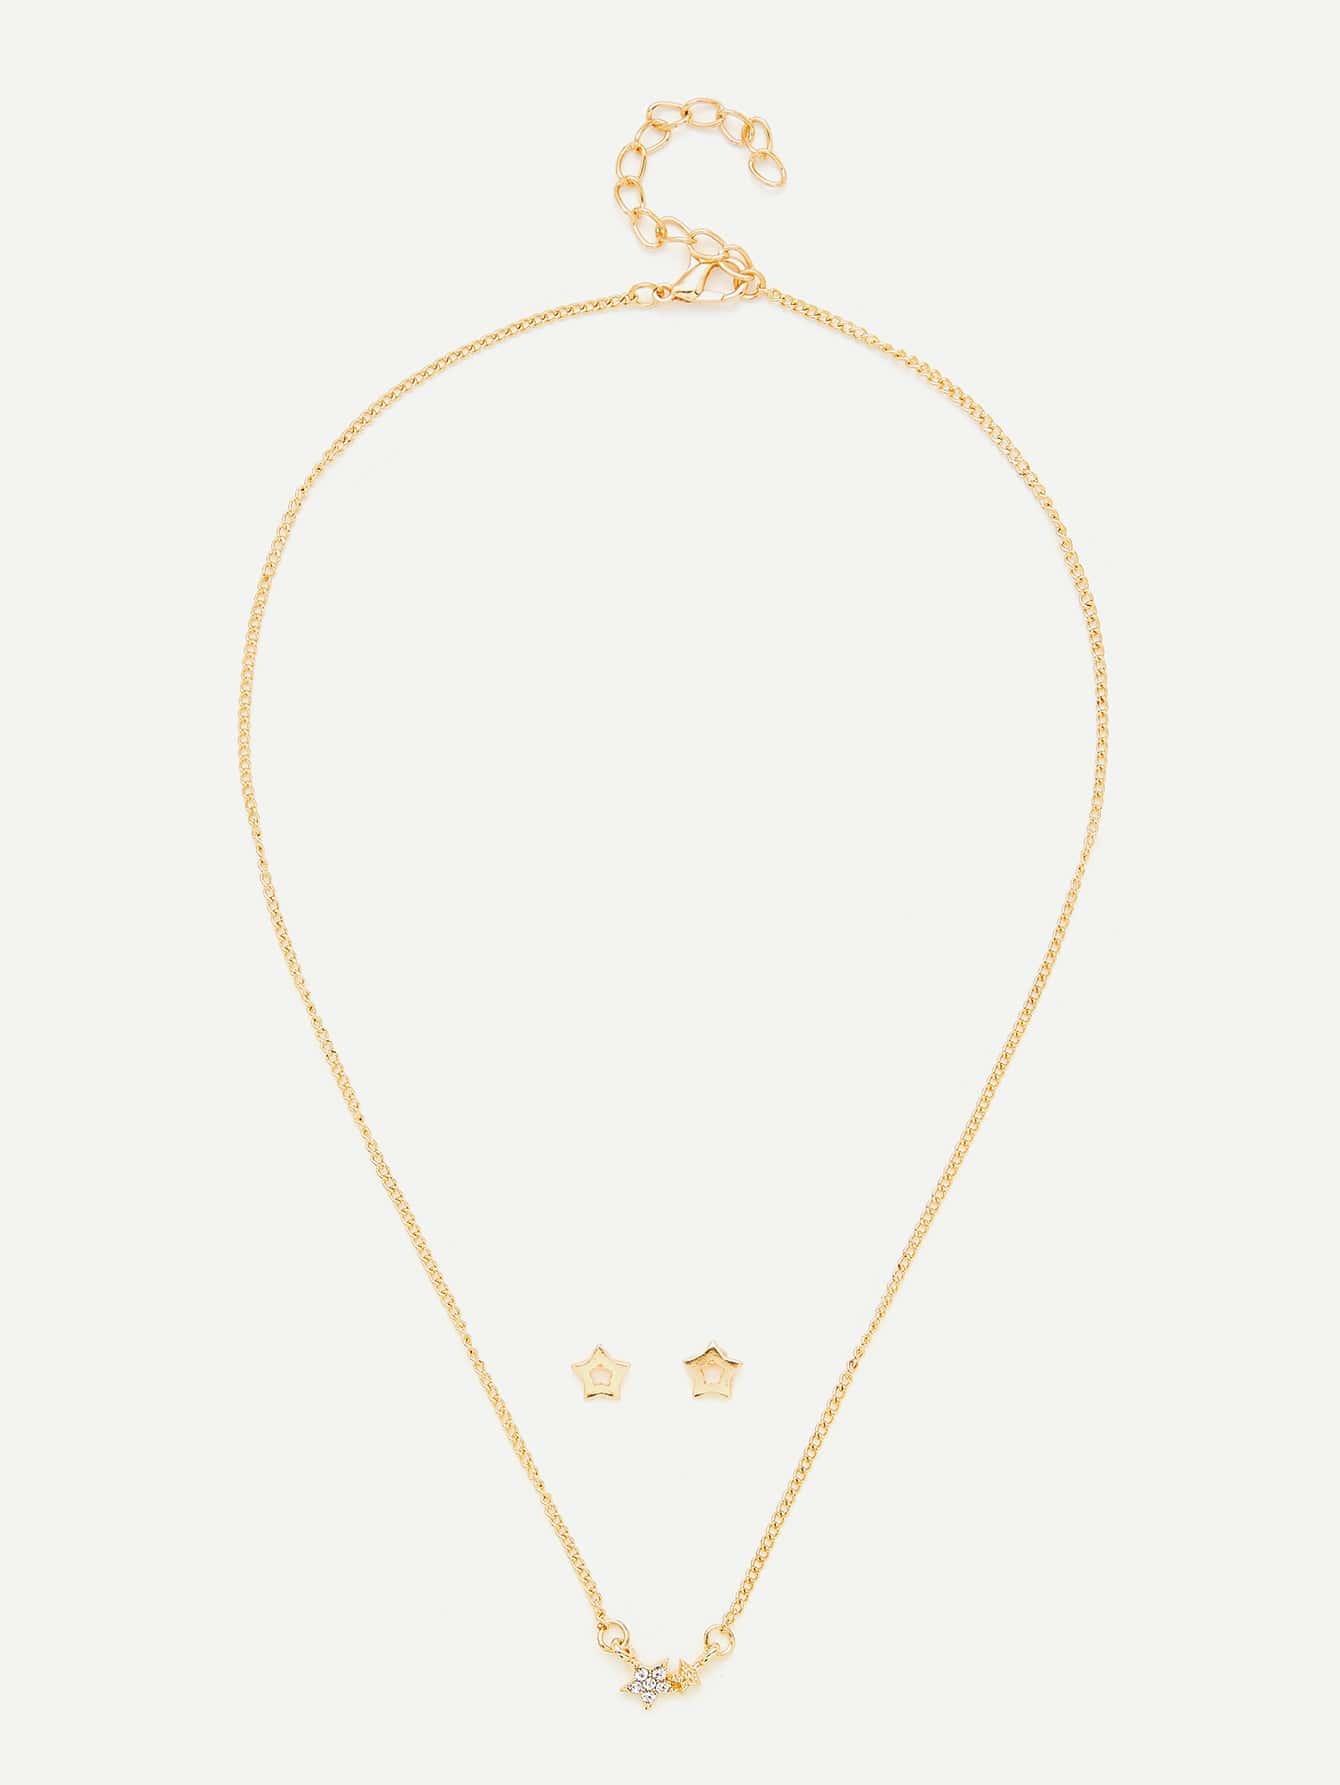 Star Design Pendant Necklace & Earring Set er 3789 stylish retro jewelled pendant earring navy blue 2 pcs